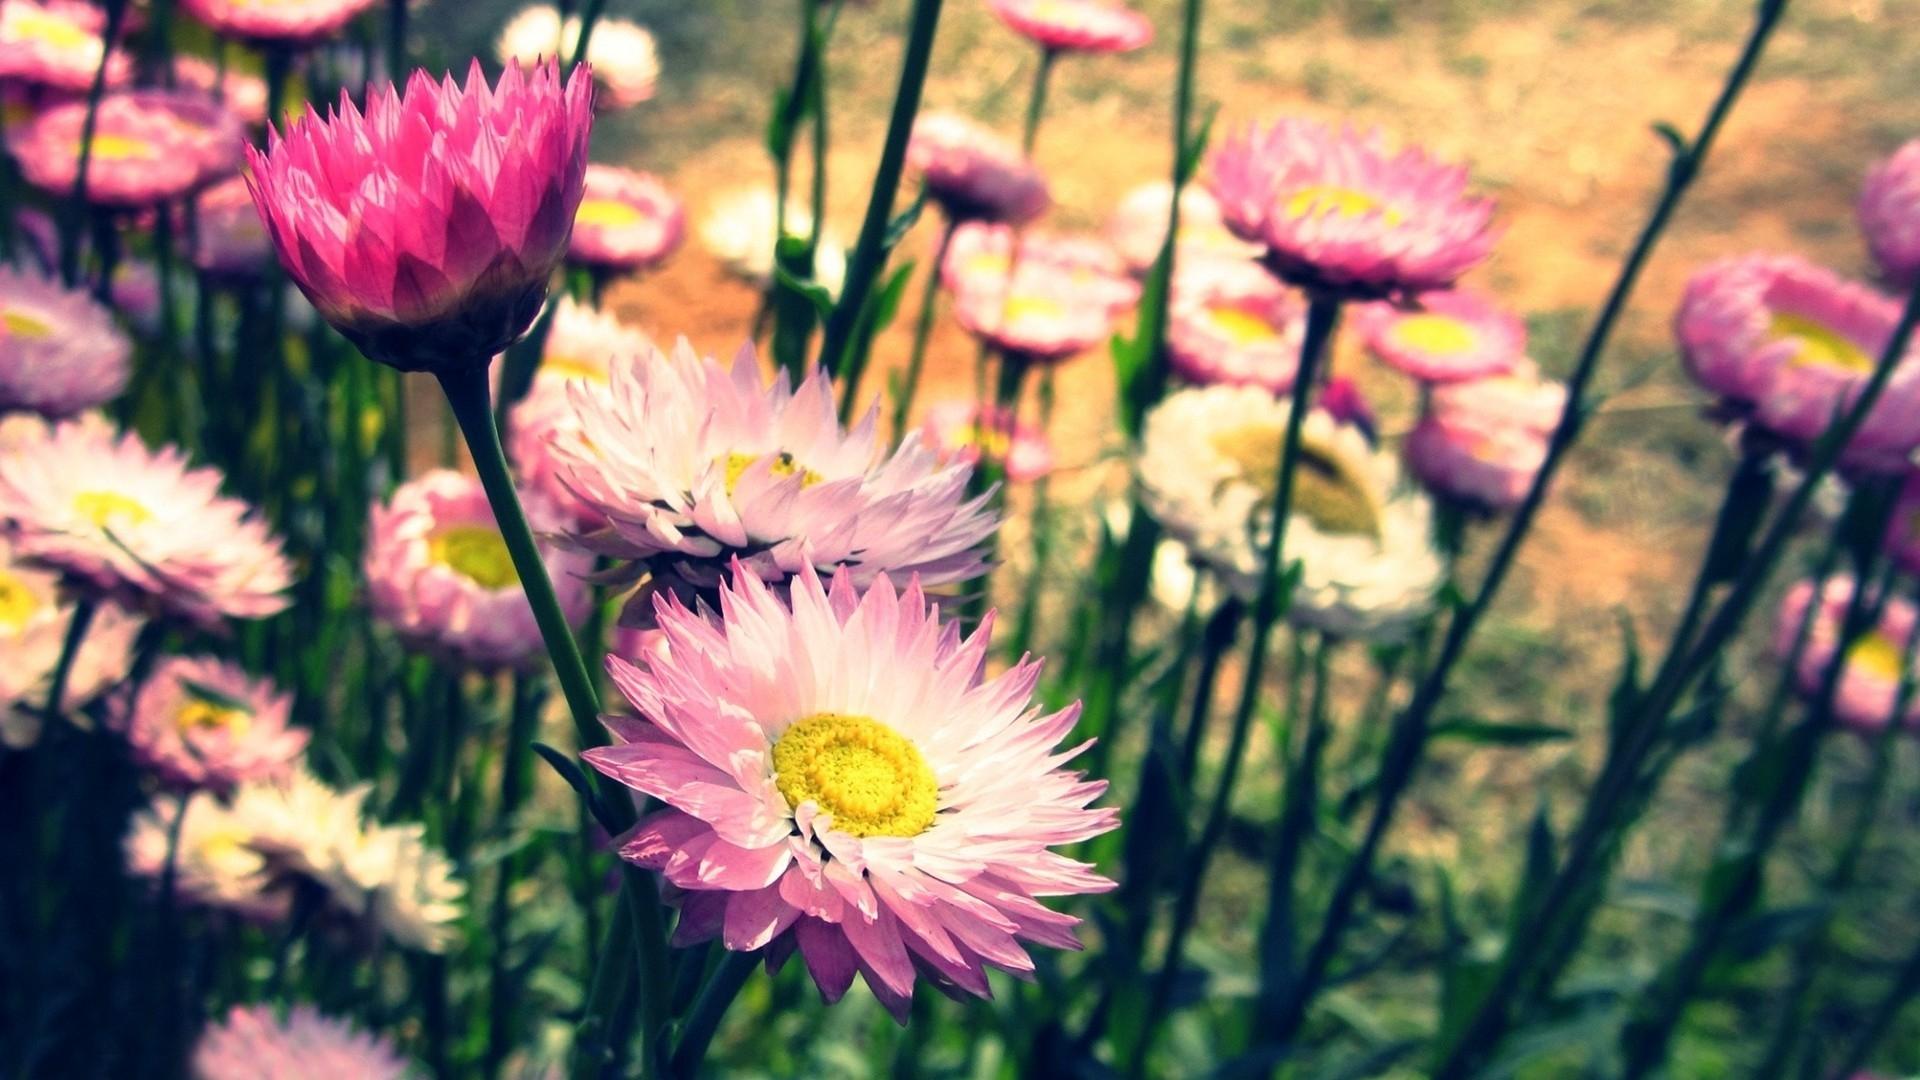 Desktop Backgrounds Flowers Vintage - HD Wallpaper